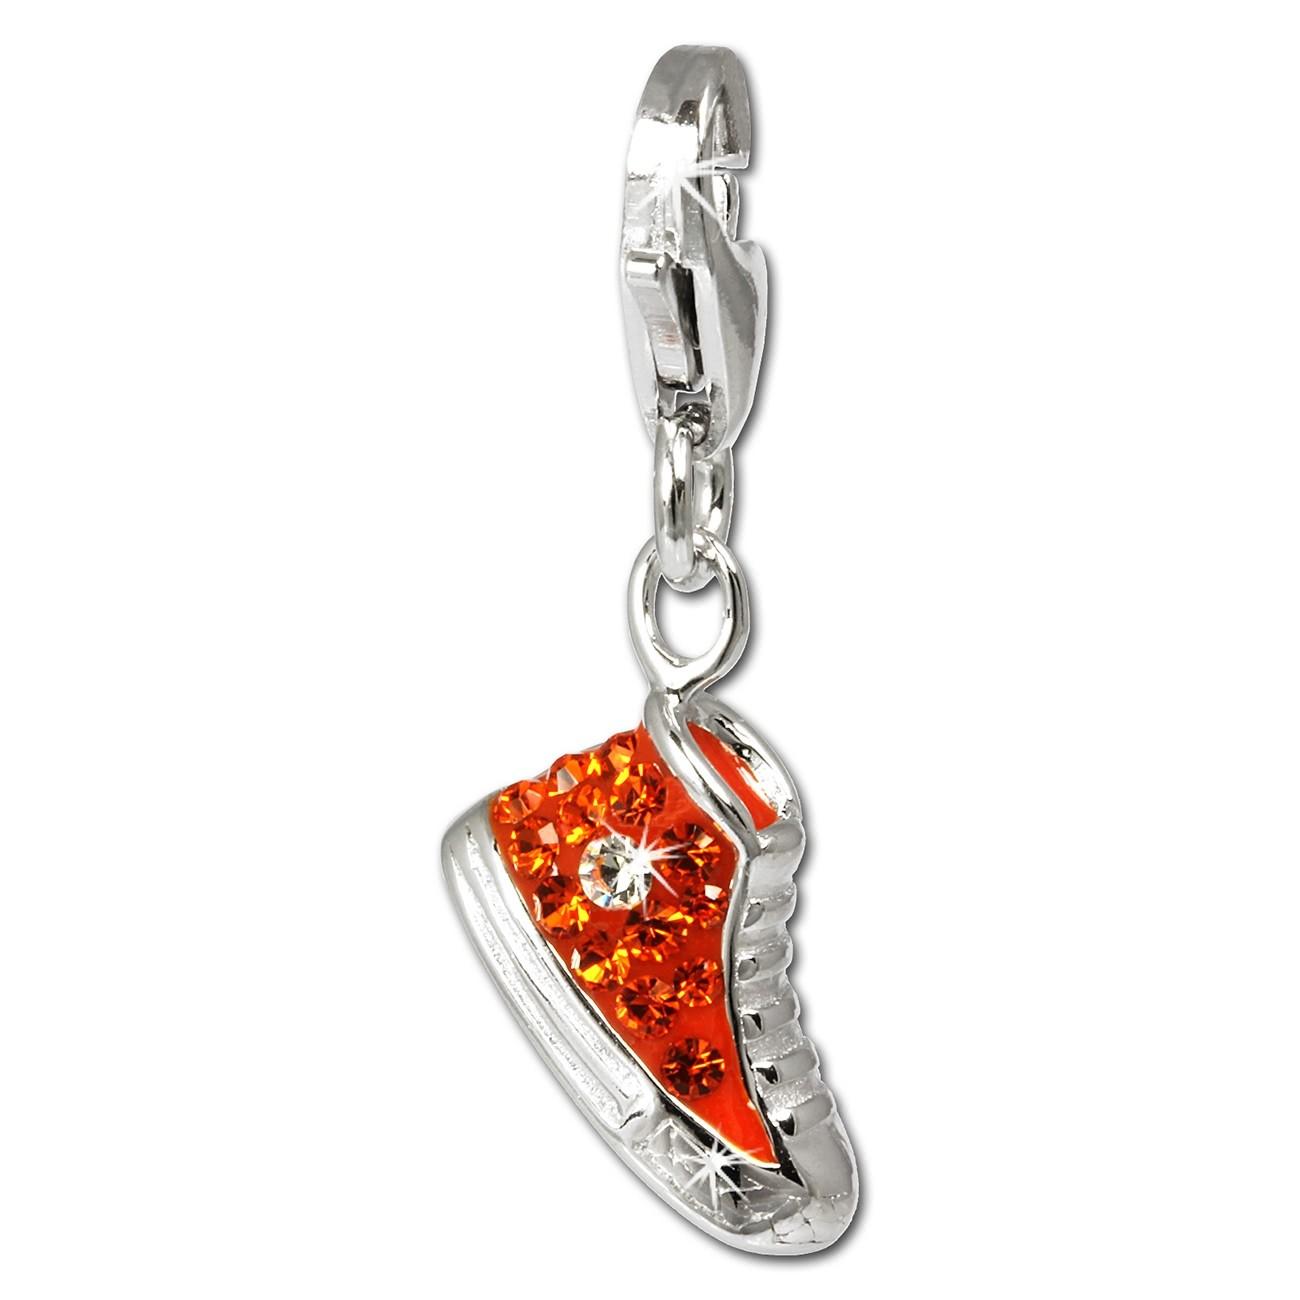 SilberDream Glitzer Charm Sneaker orange Zirkonia Kristalle GSC515O